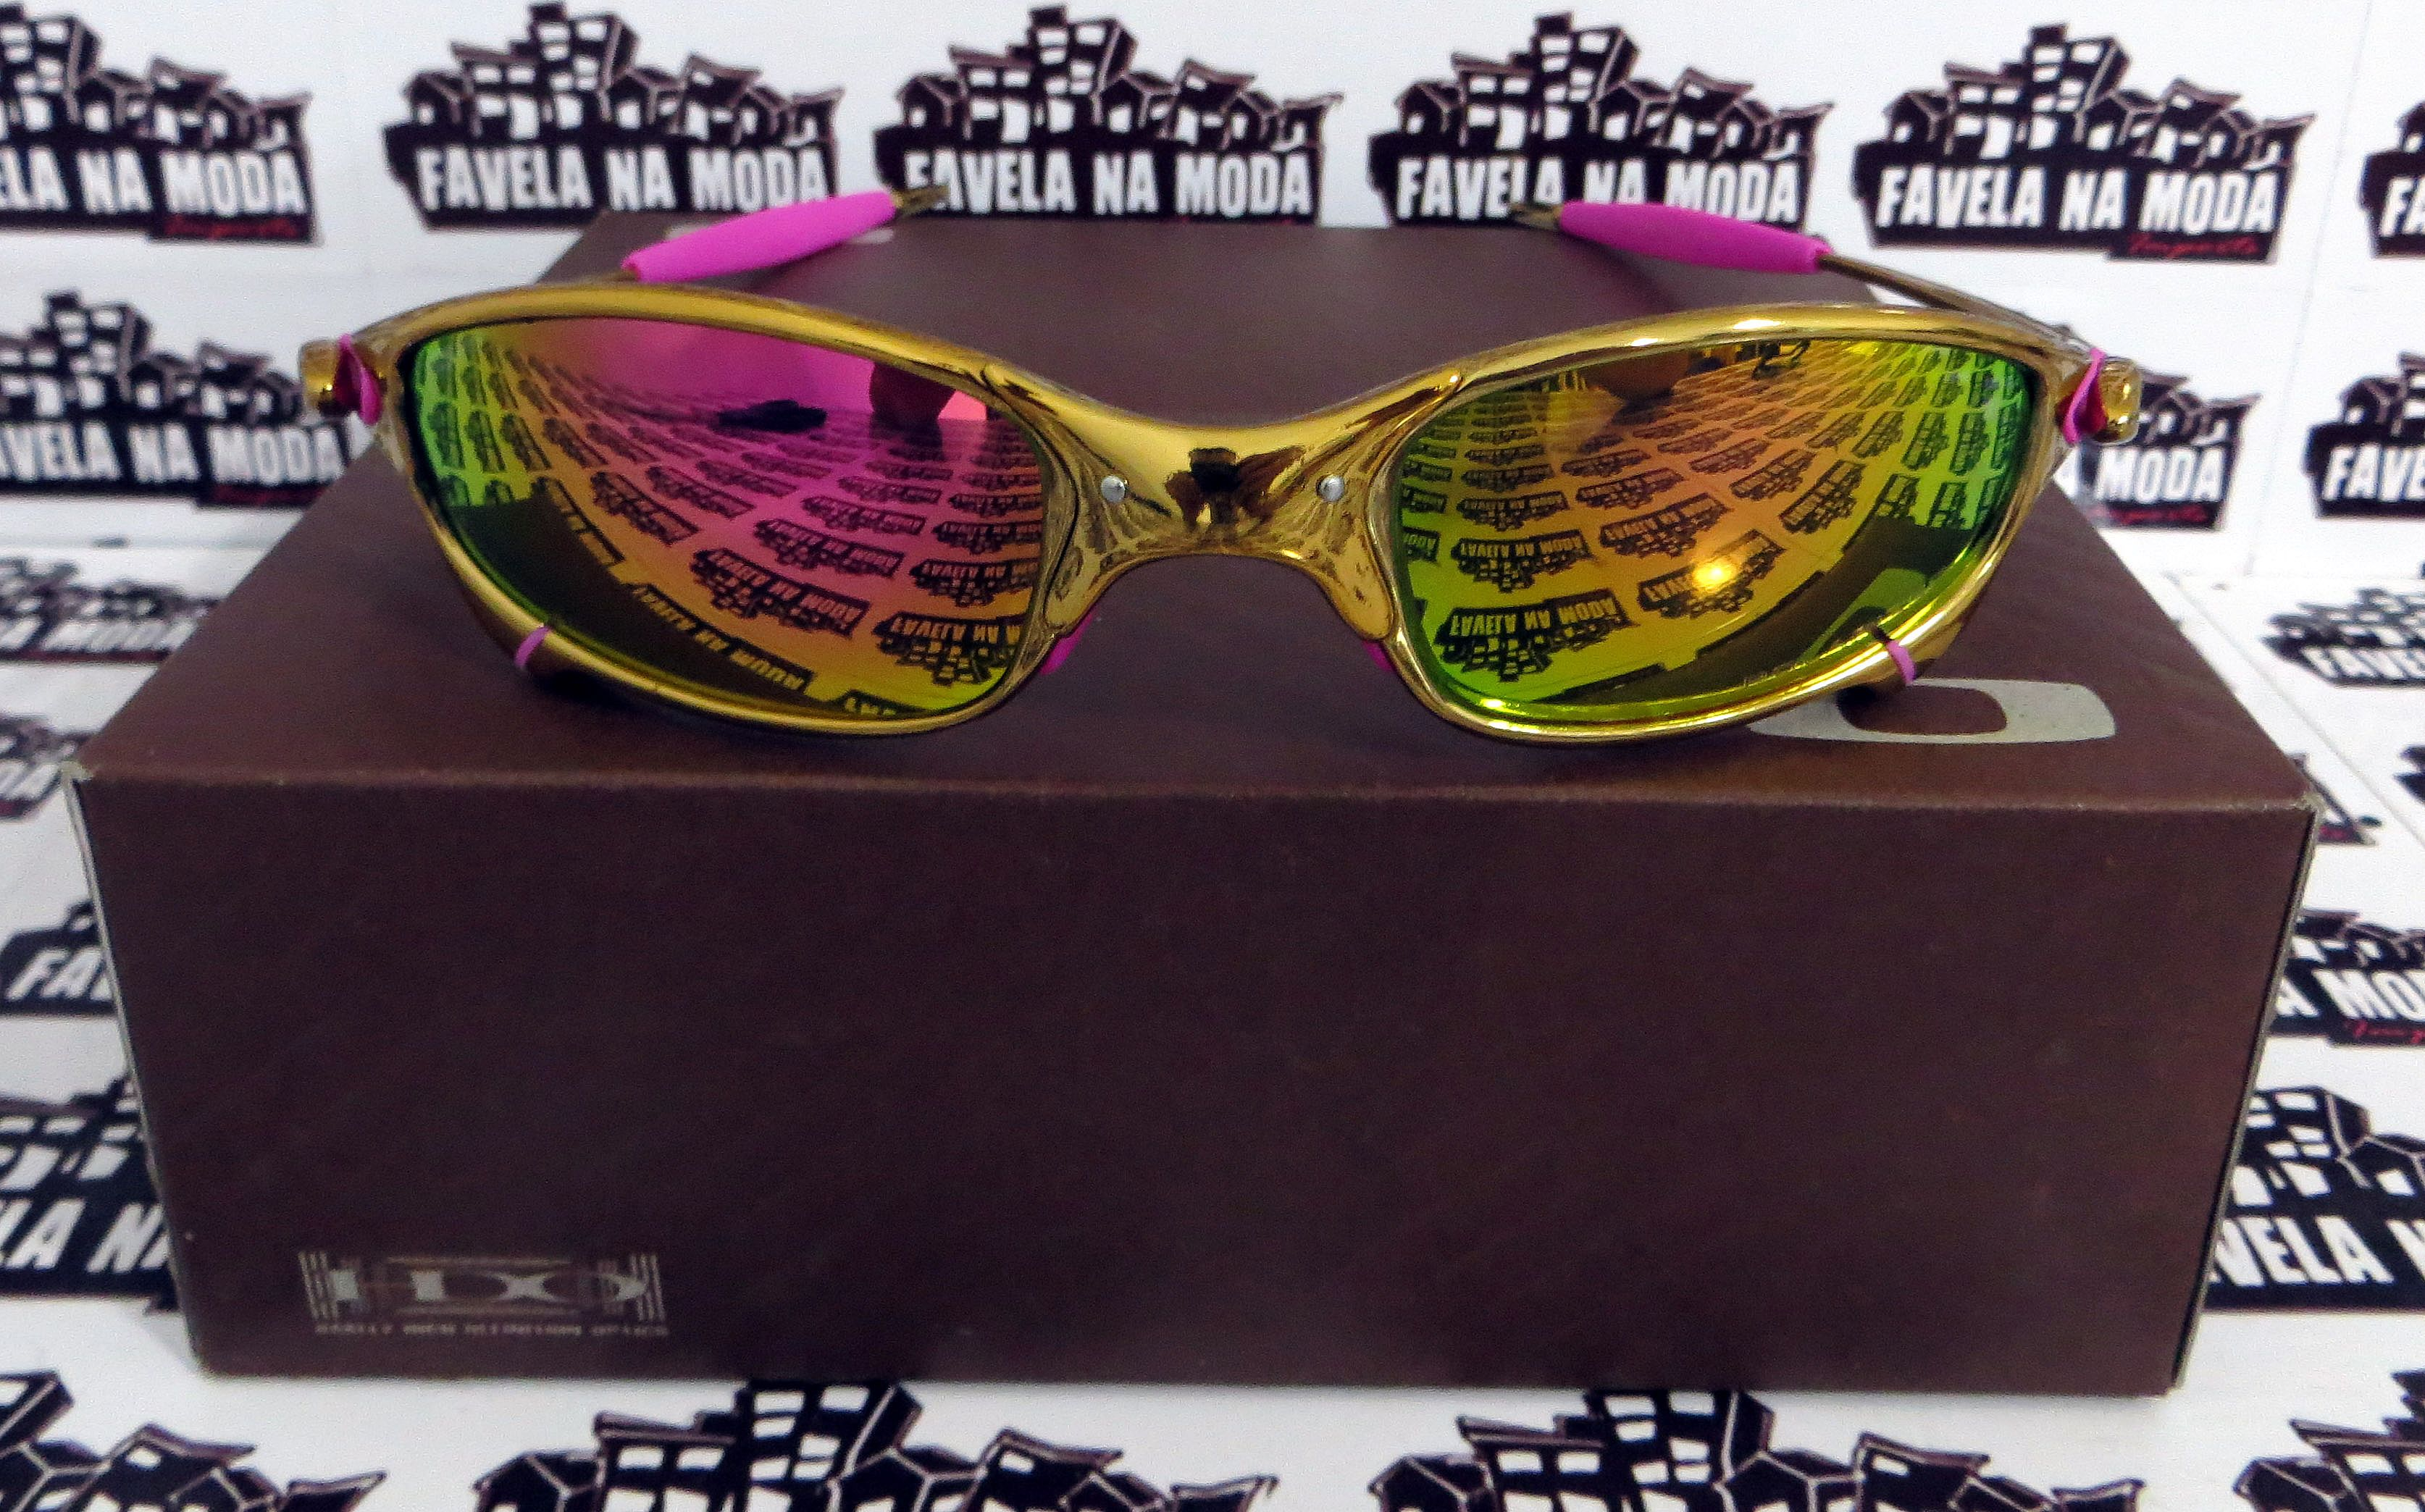 10edae6c0e616 Óculos Oakley Juliet - Gold   Pink   Borrachas Rosa